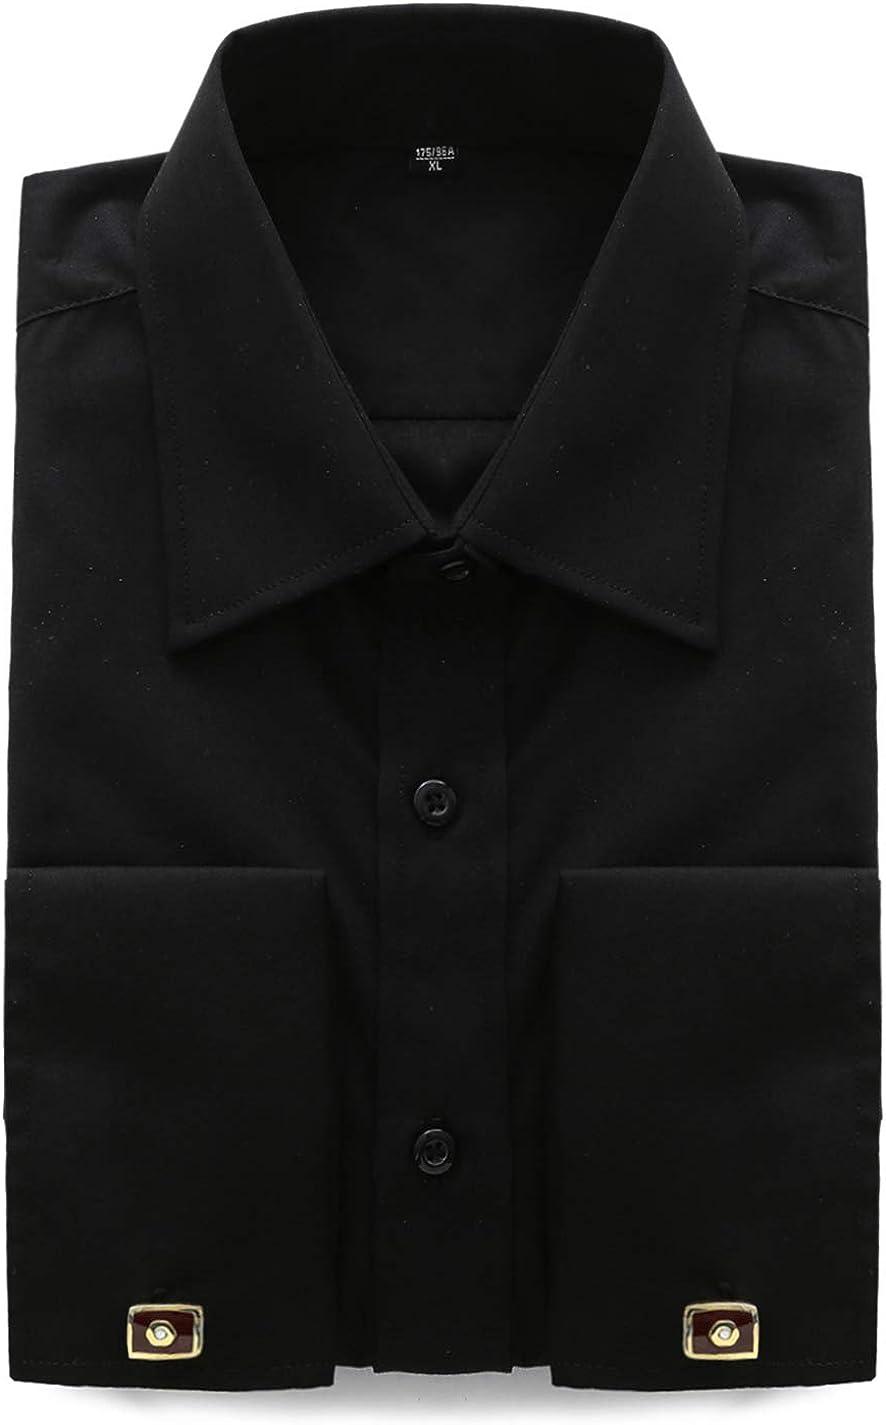 Jandukar Men's French Cuff Sold Long Sleeve Dress Shirts (Cufflink Included)